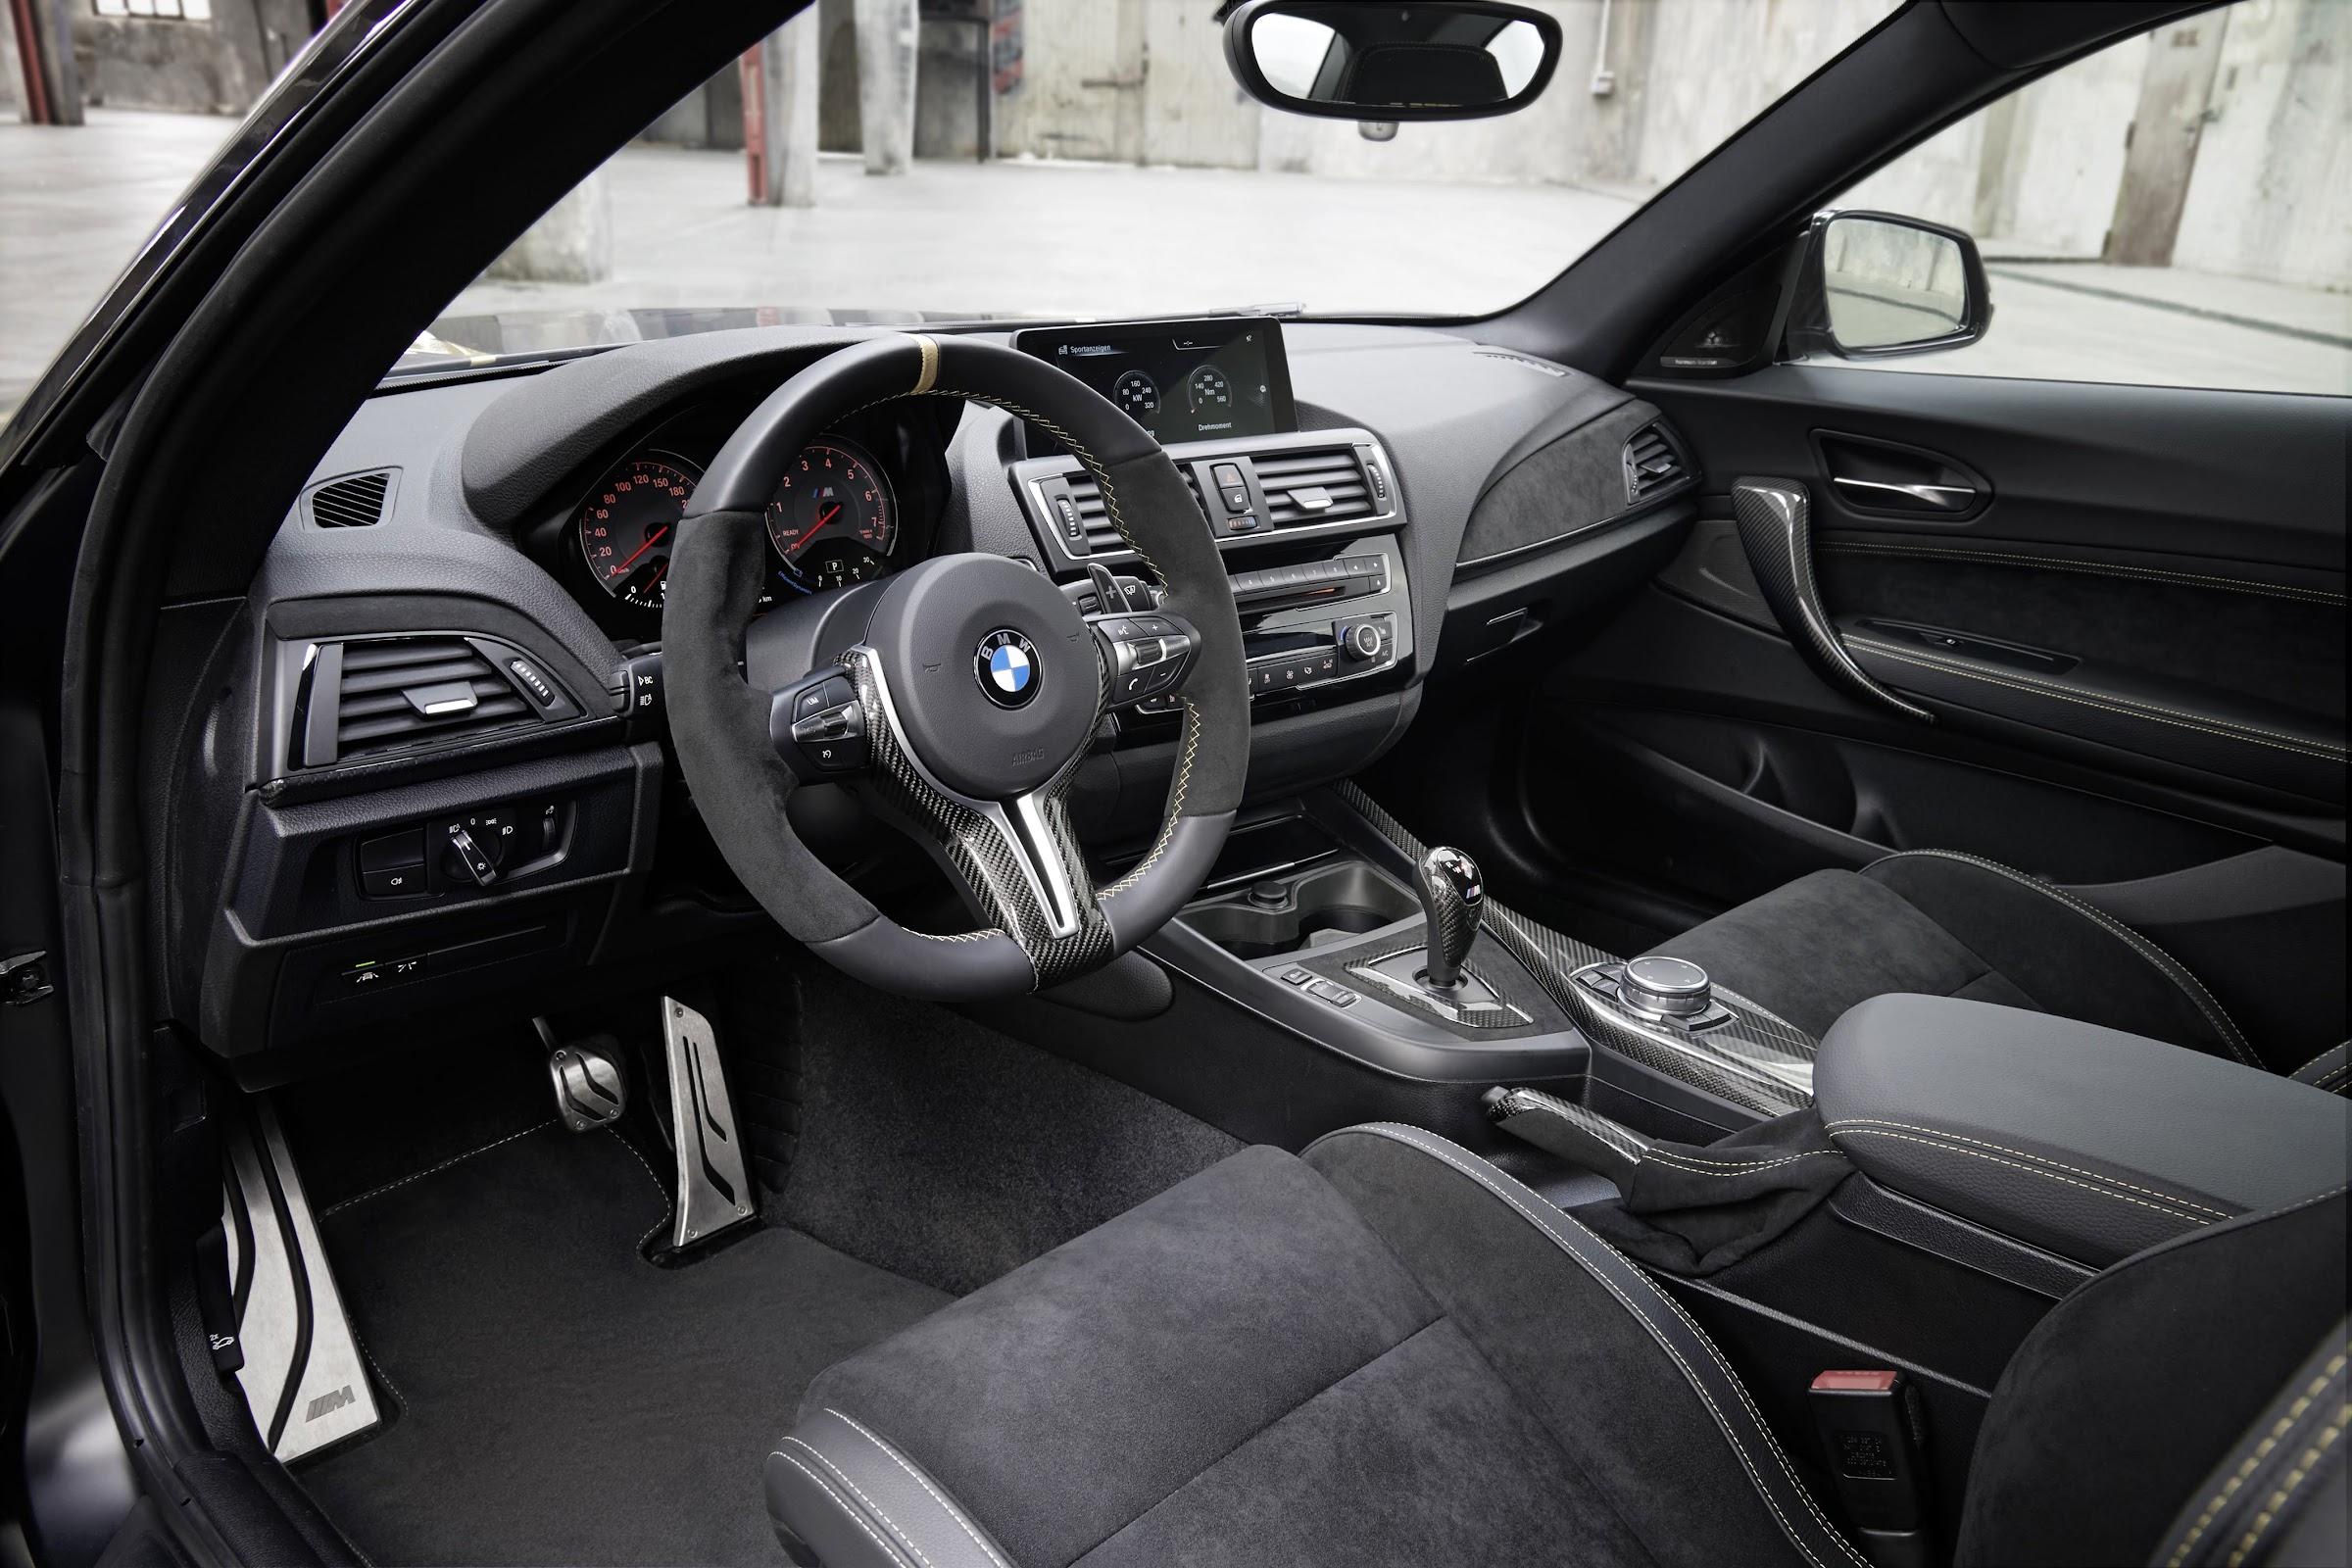 fQp6pV2ahShktpcwZZ9sfIBZefeW nICnSr1yDxf YIIAZnHzaKnbcW6By97m0u3R zJ9GR eAXH hy4aKw Gn jccYEa0jPDmFCIIq02iqiNSrzrPSBxXfTTNmvN55HMHZvOt VBg=w2400 - Nuevo BMW M Performance Parts Concept